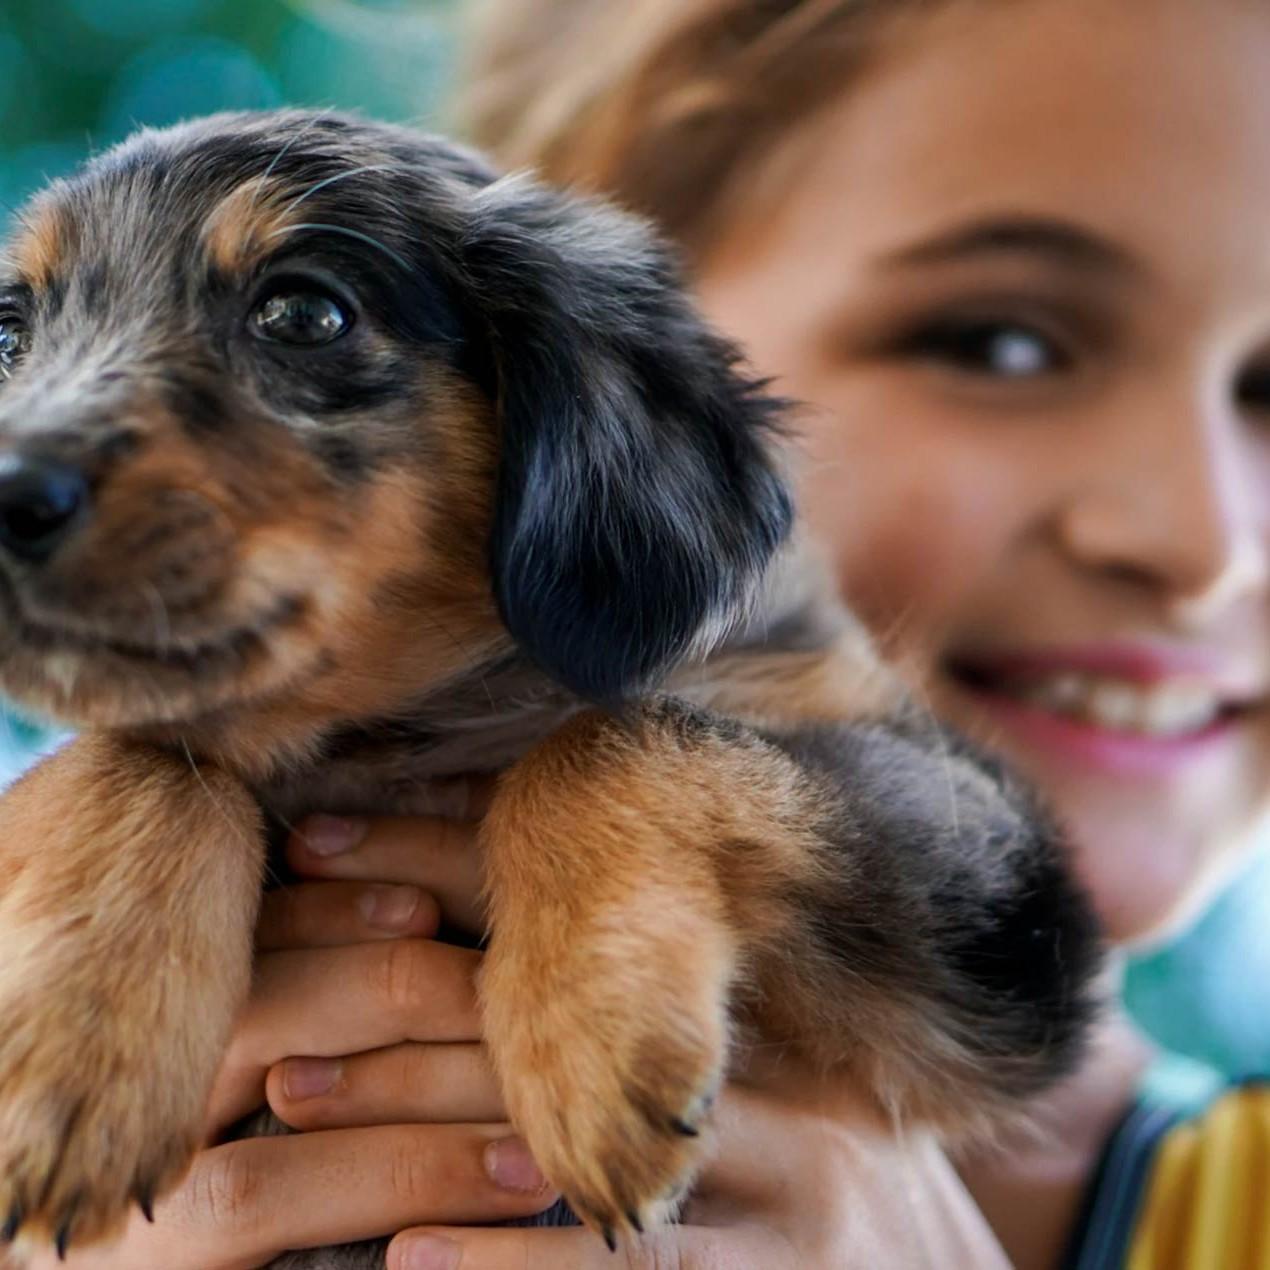 Benefits of having pets in children's social-emotional development